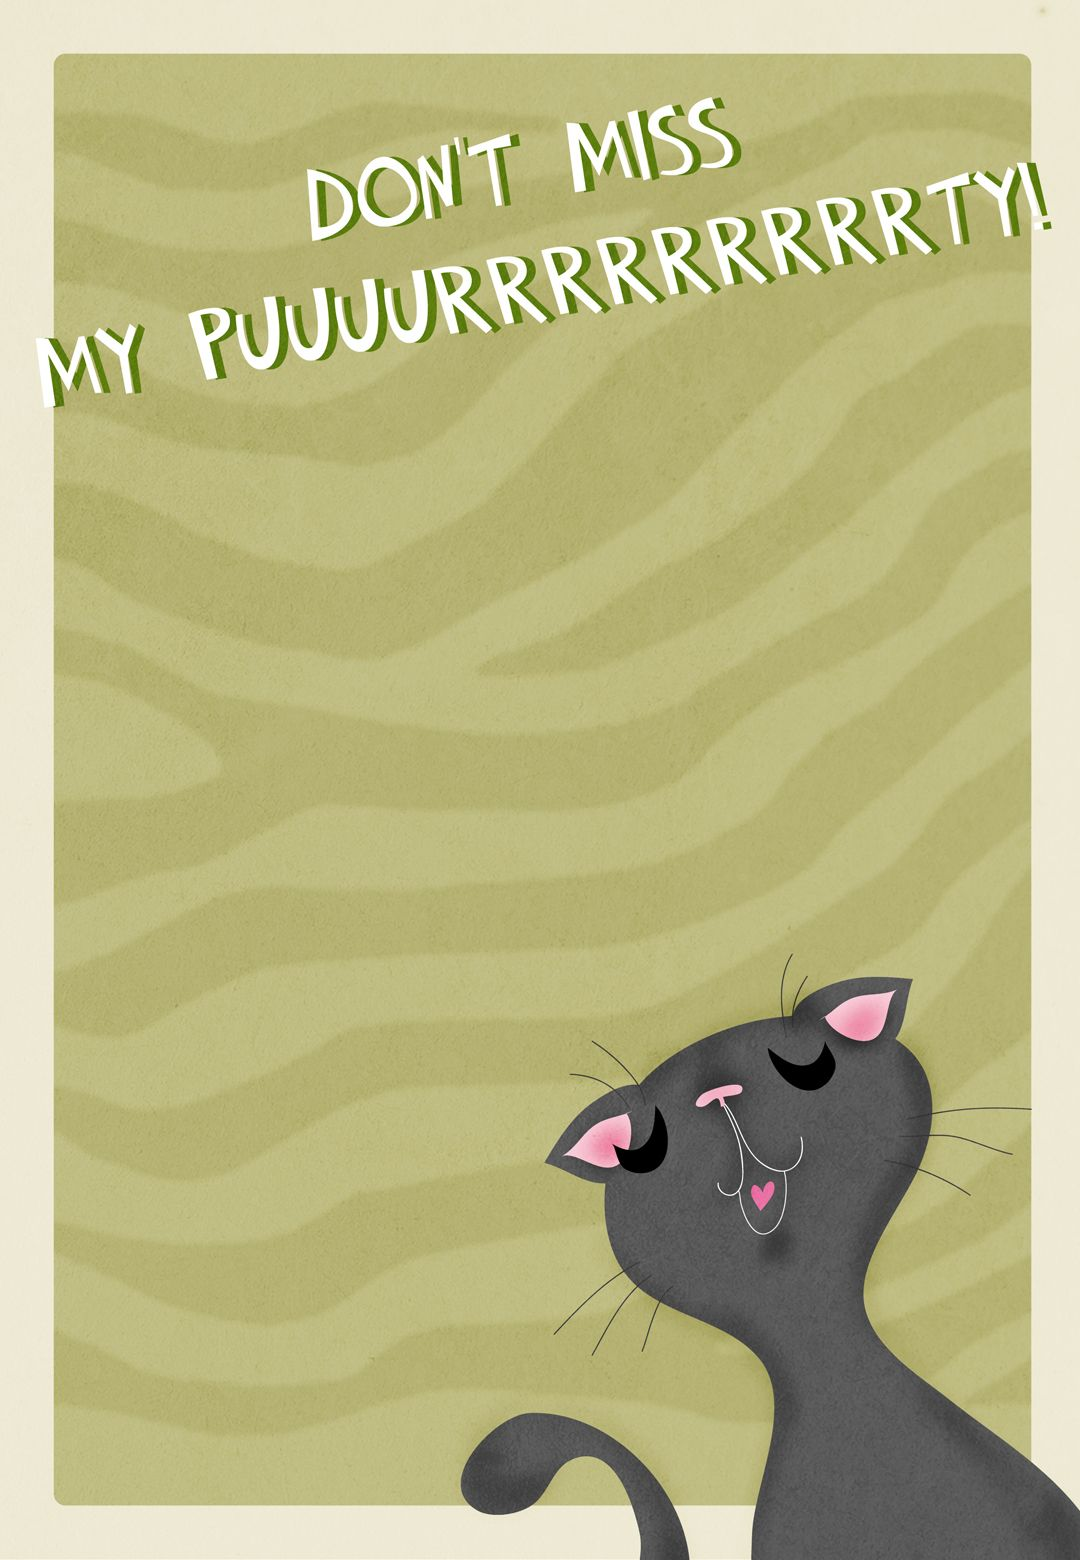 Diy party costume mask black cat kitten template printable - Purrrrty Free Printable Birthday Invitation Template Greetings Island